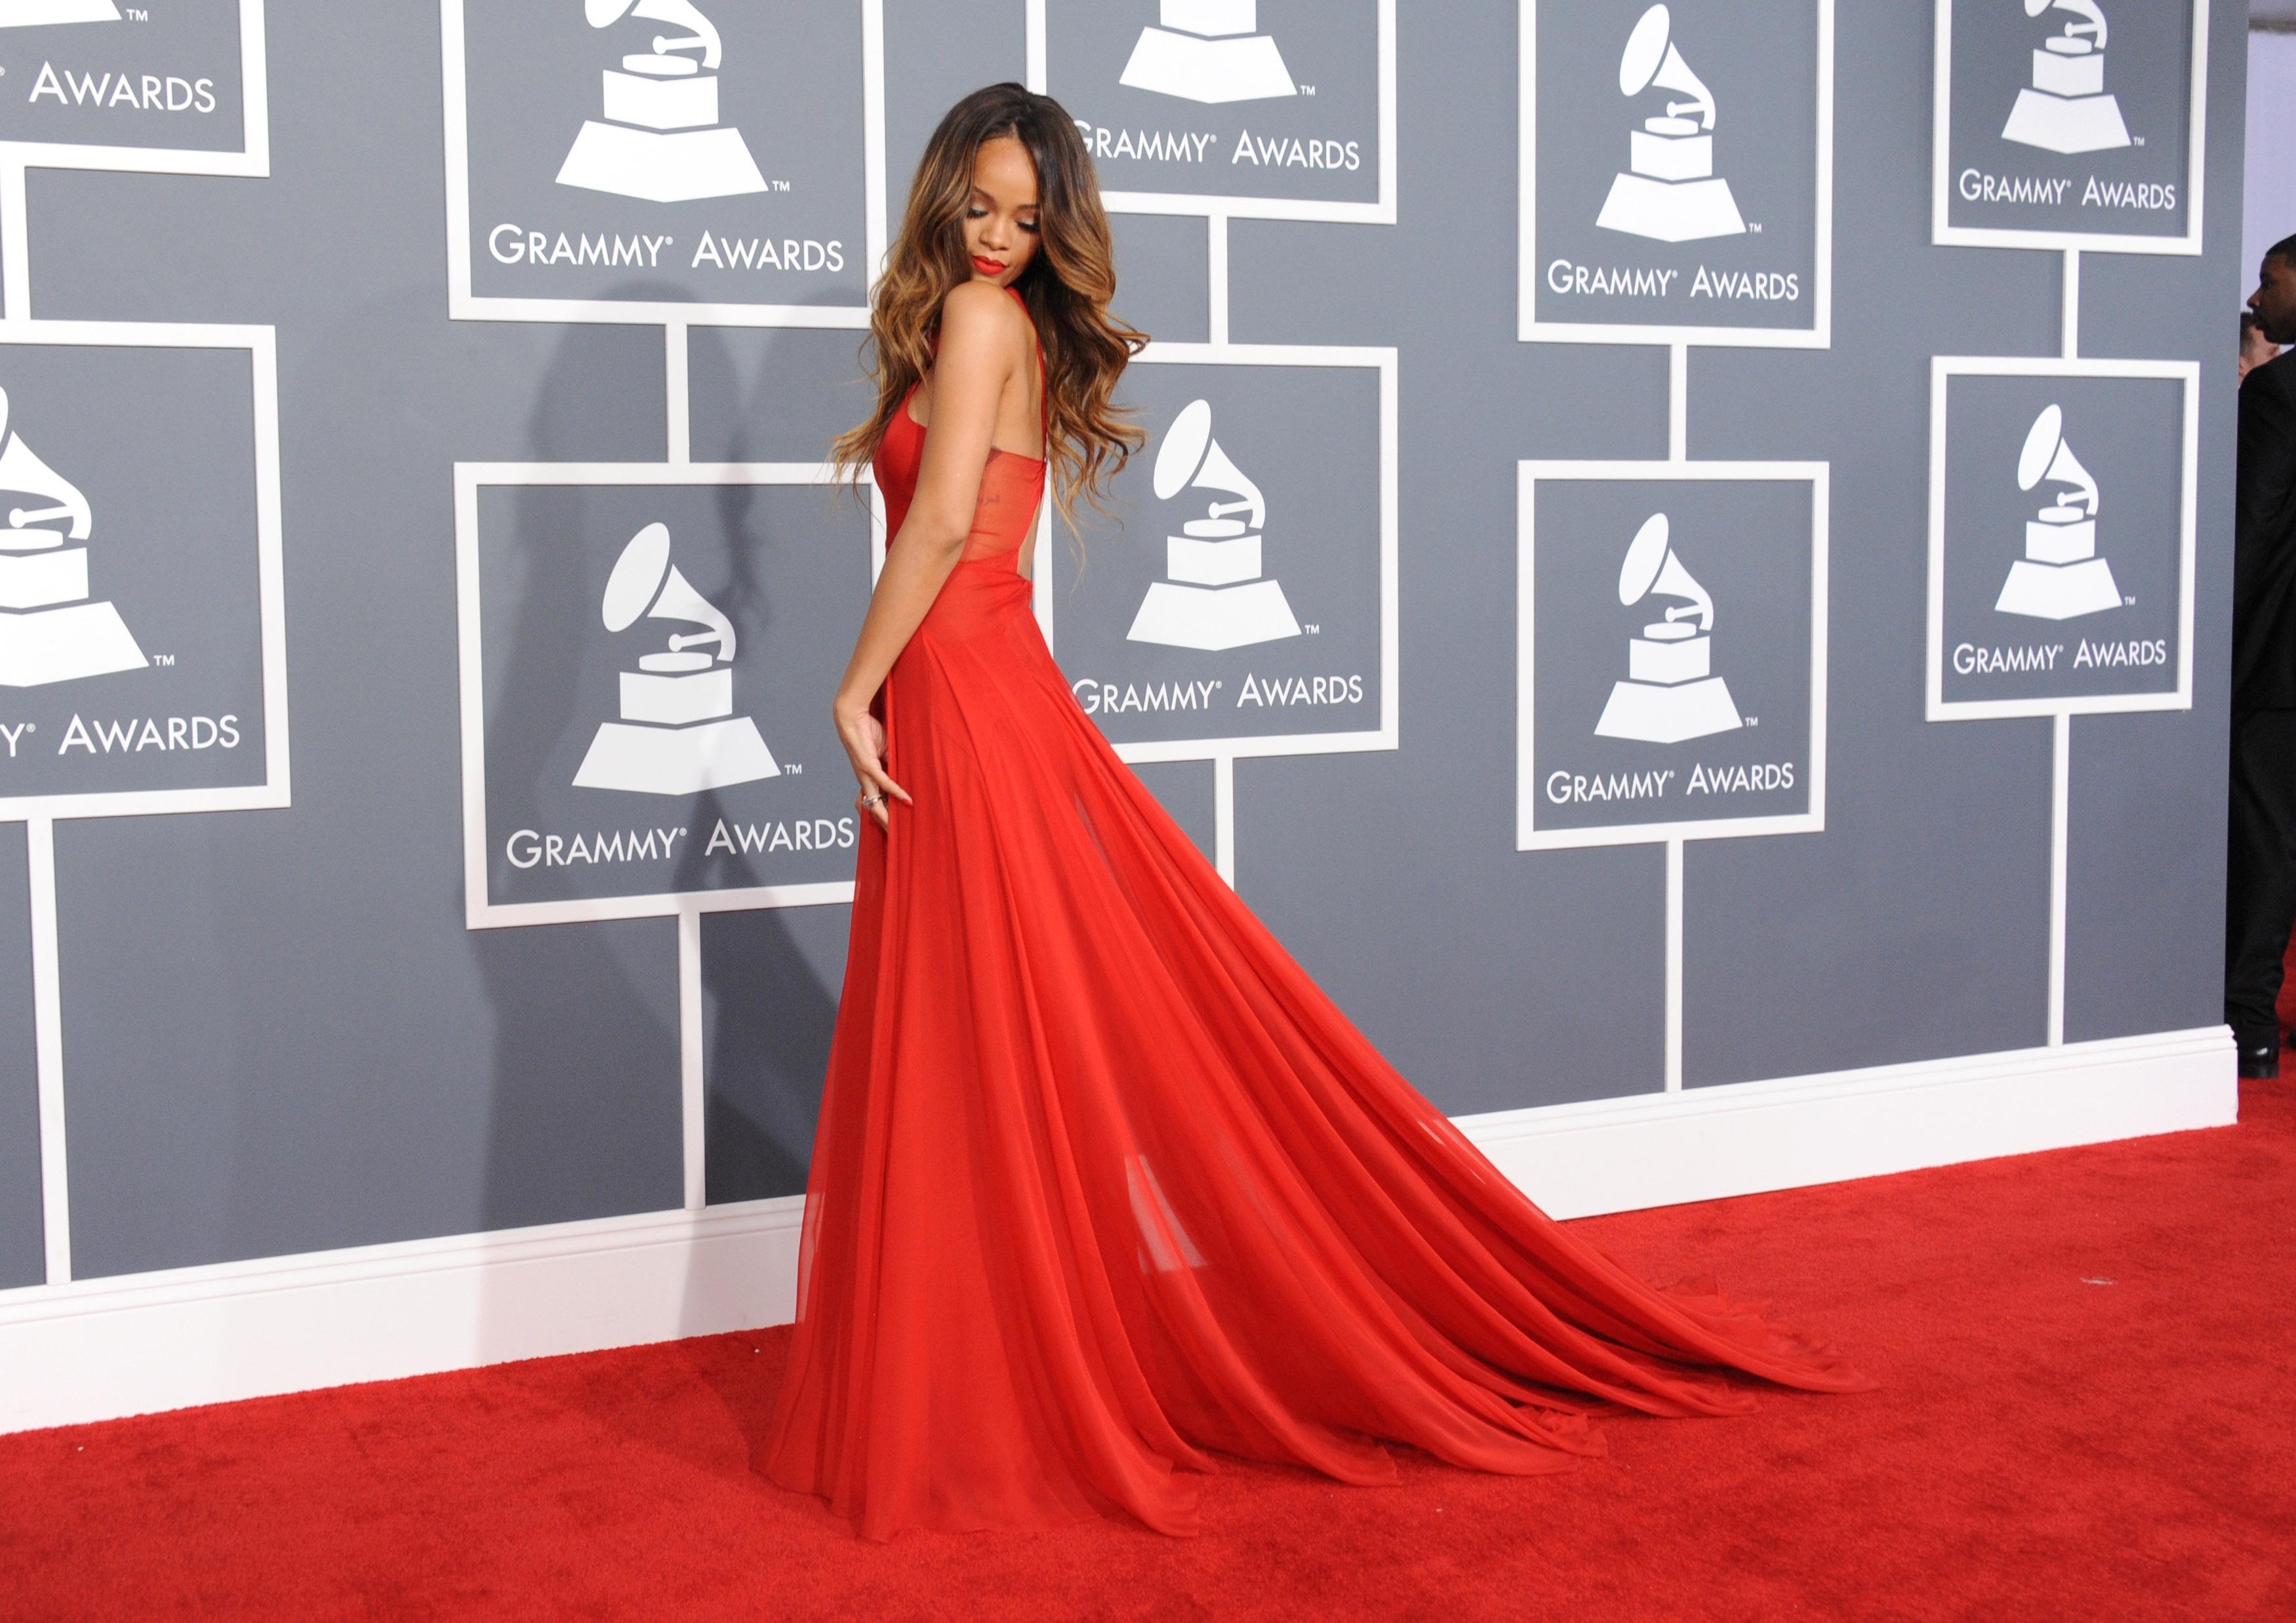 Grammys: Rihanna Vedo Non Vedo Ai Cfda Awards, Eletta Icona Fashion